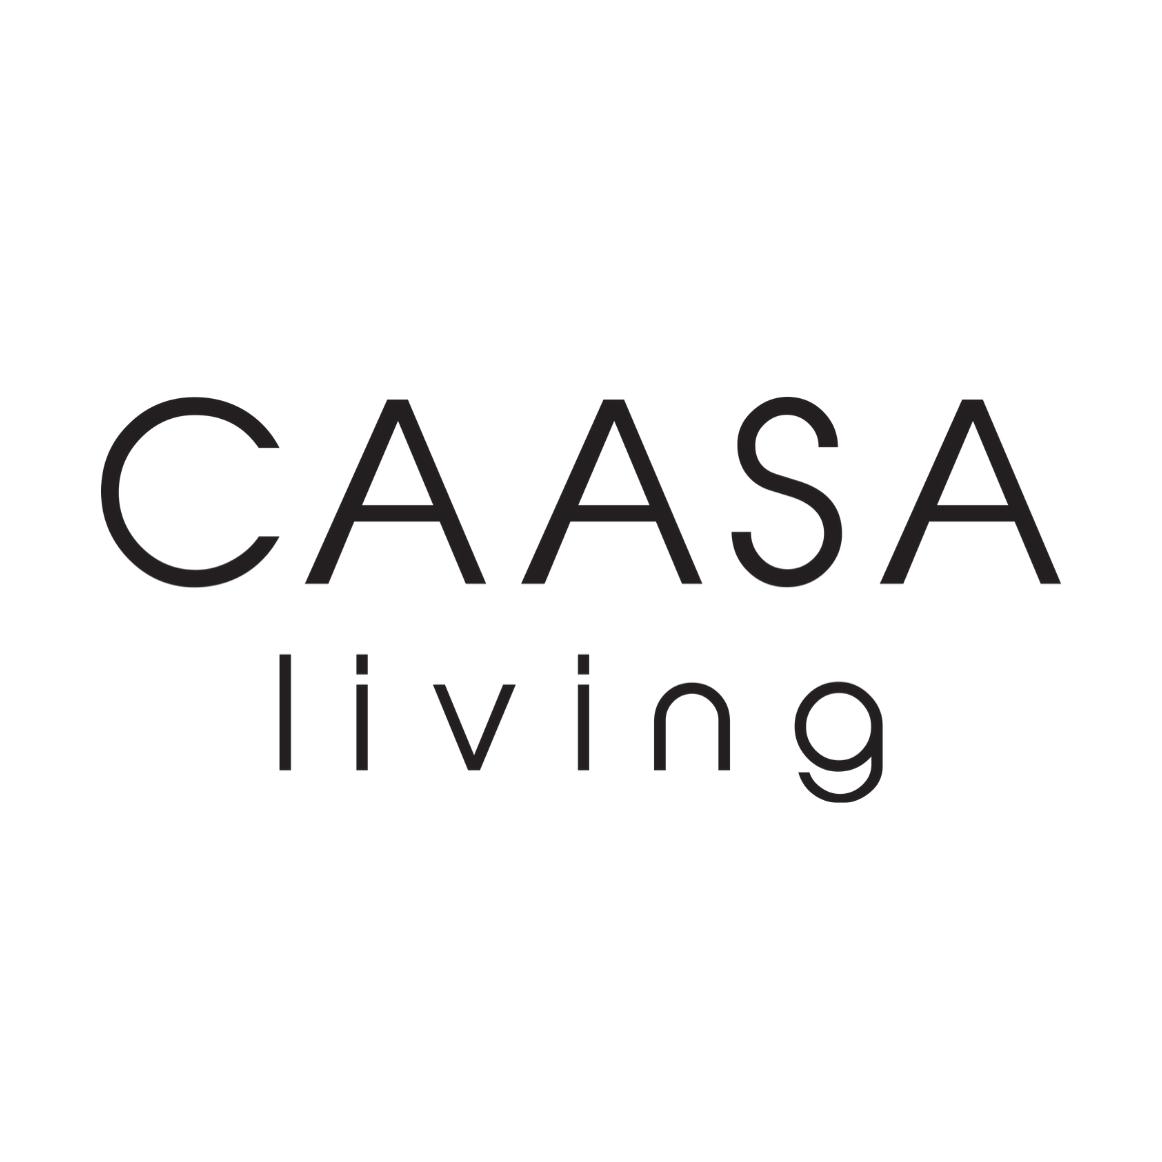 Caasa Living